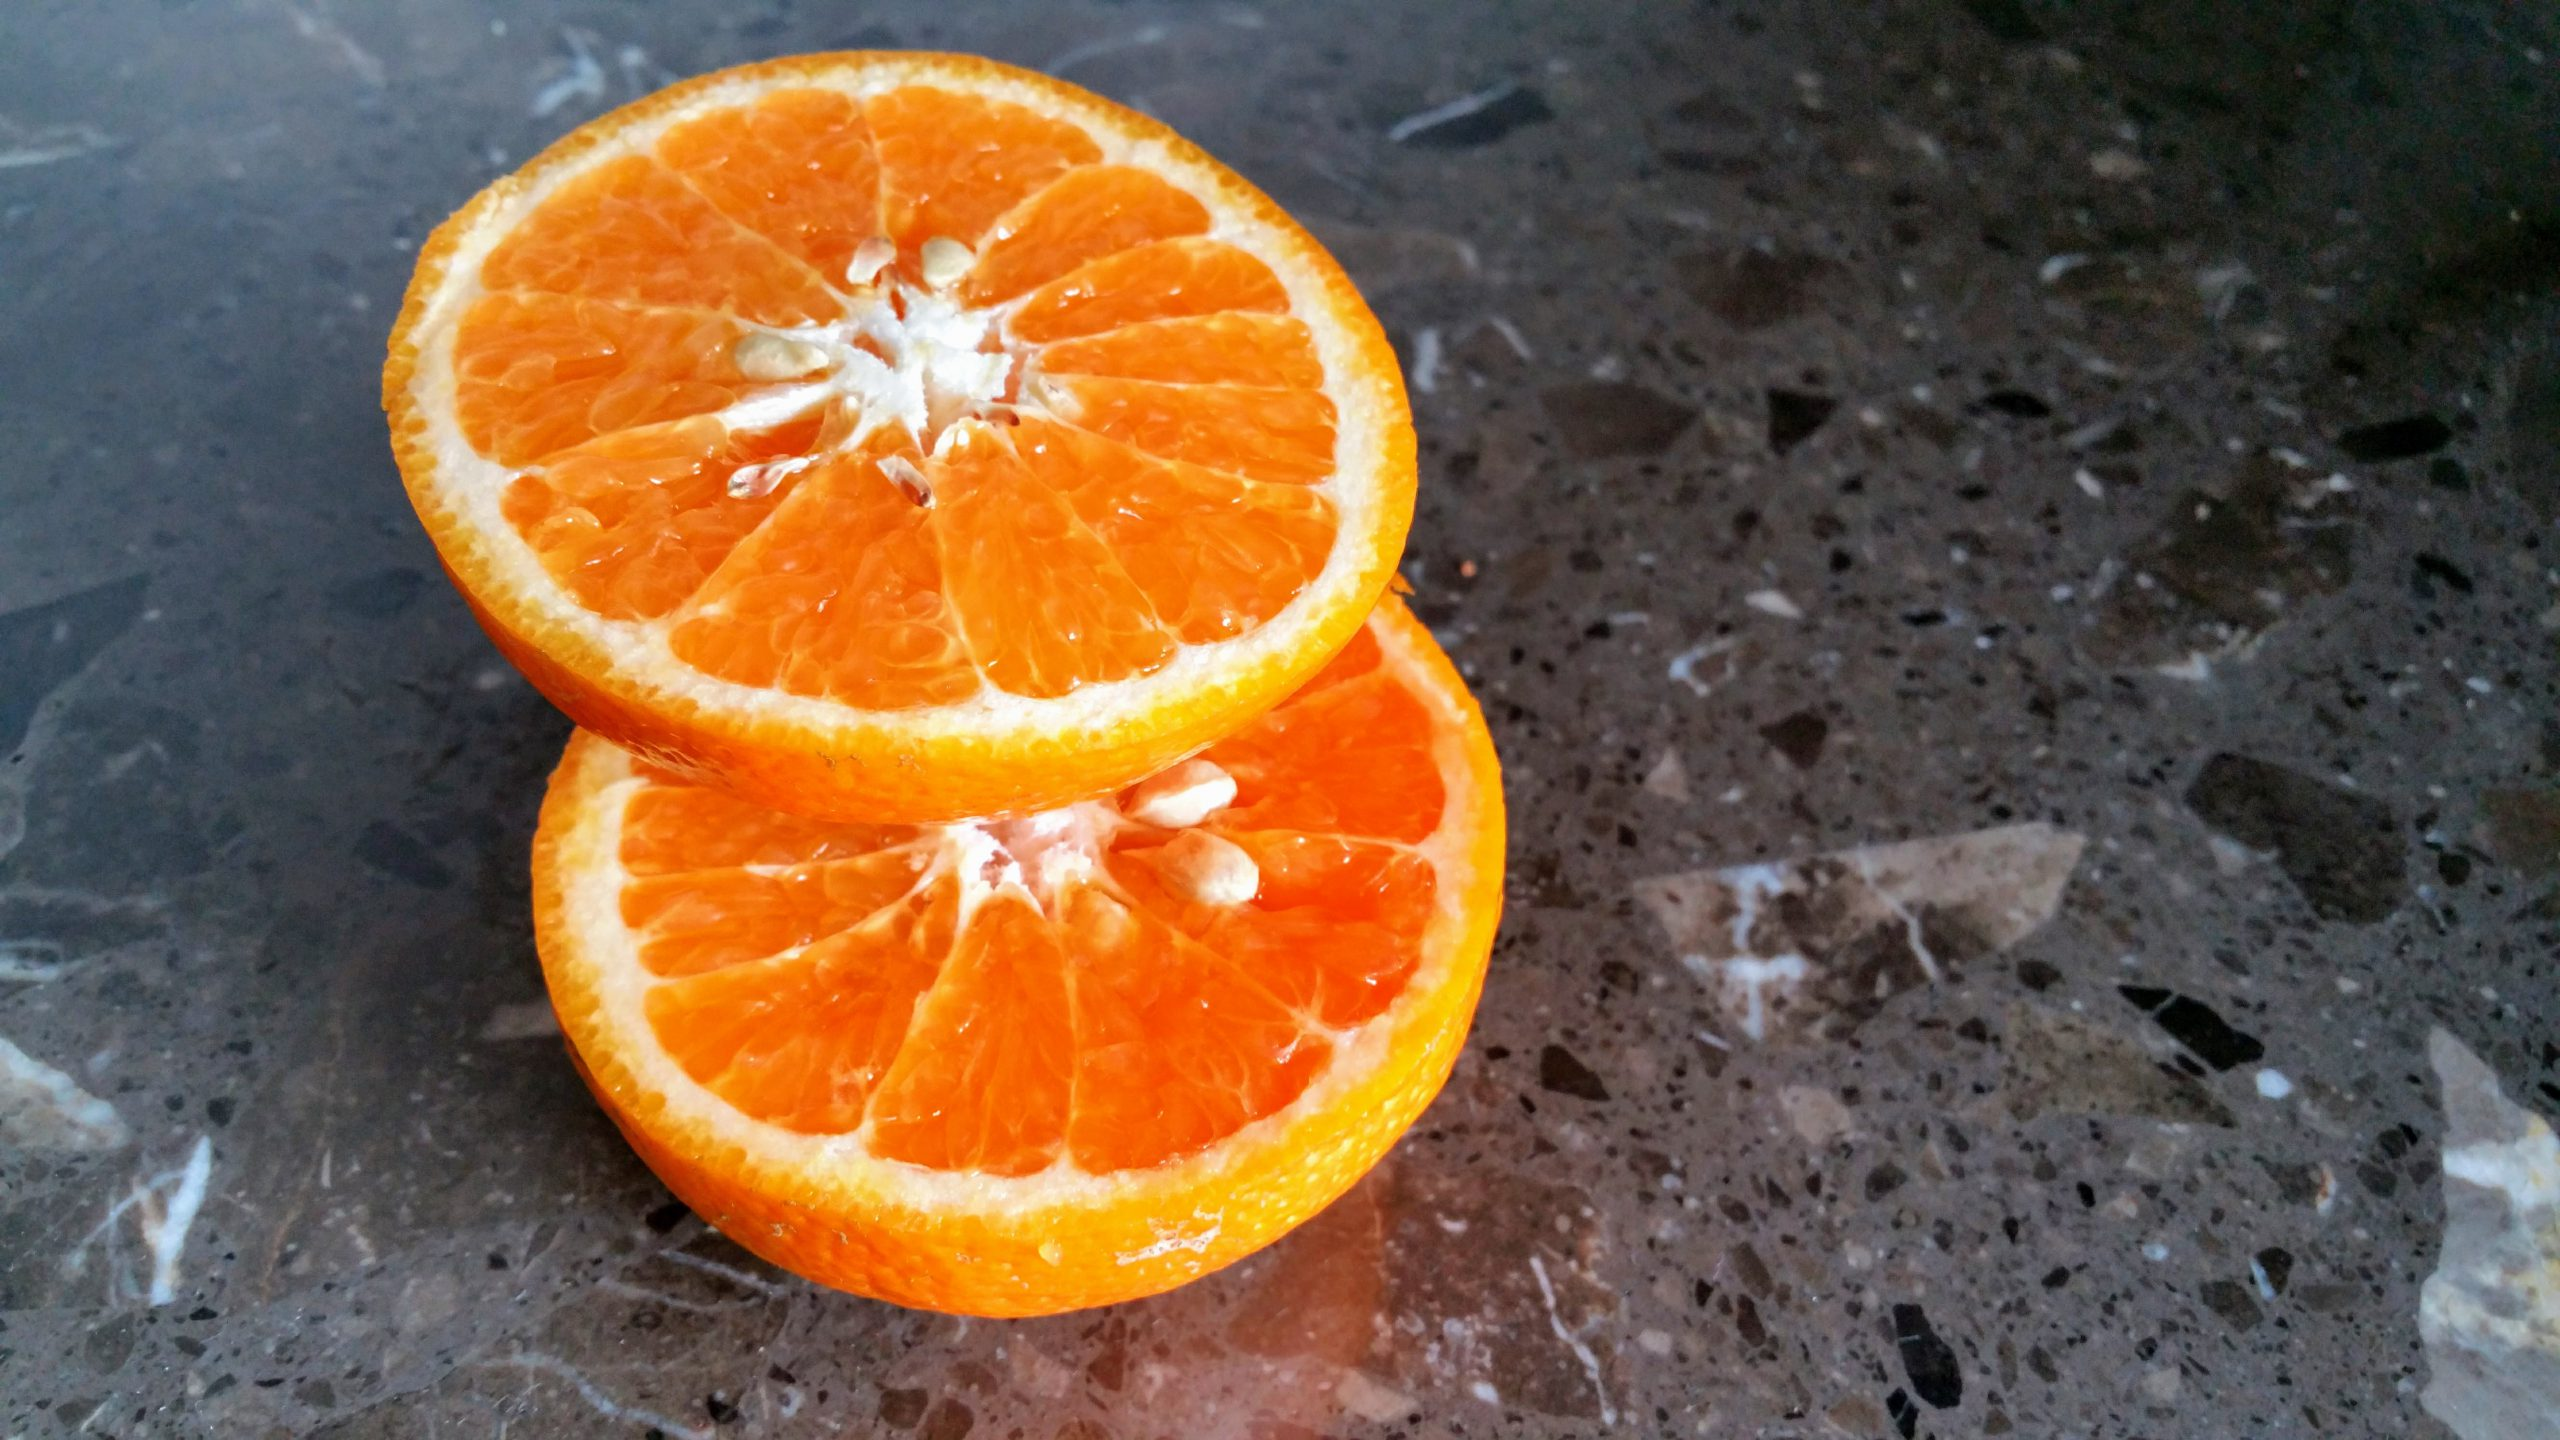 48,5% minder agressie en geweld op opvanglocaties met sinaasappelgeur!